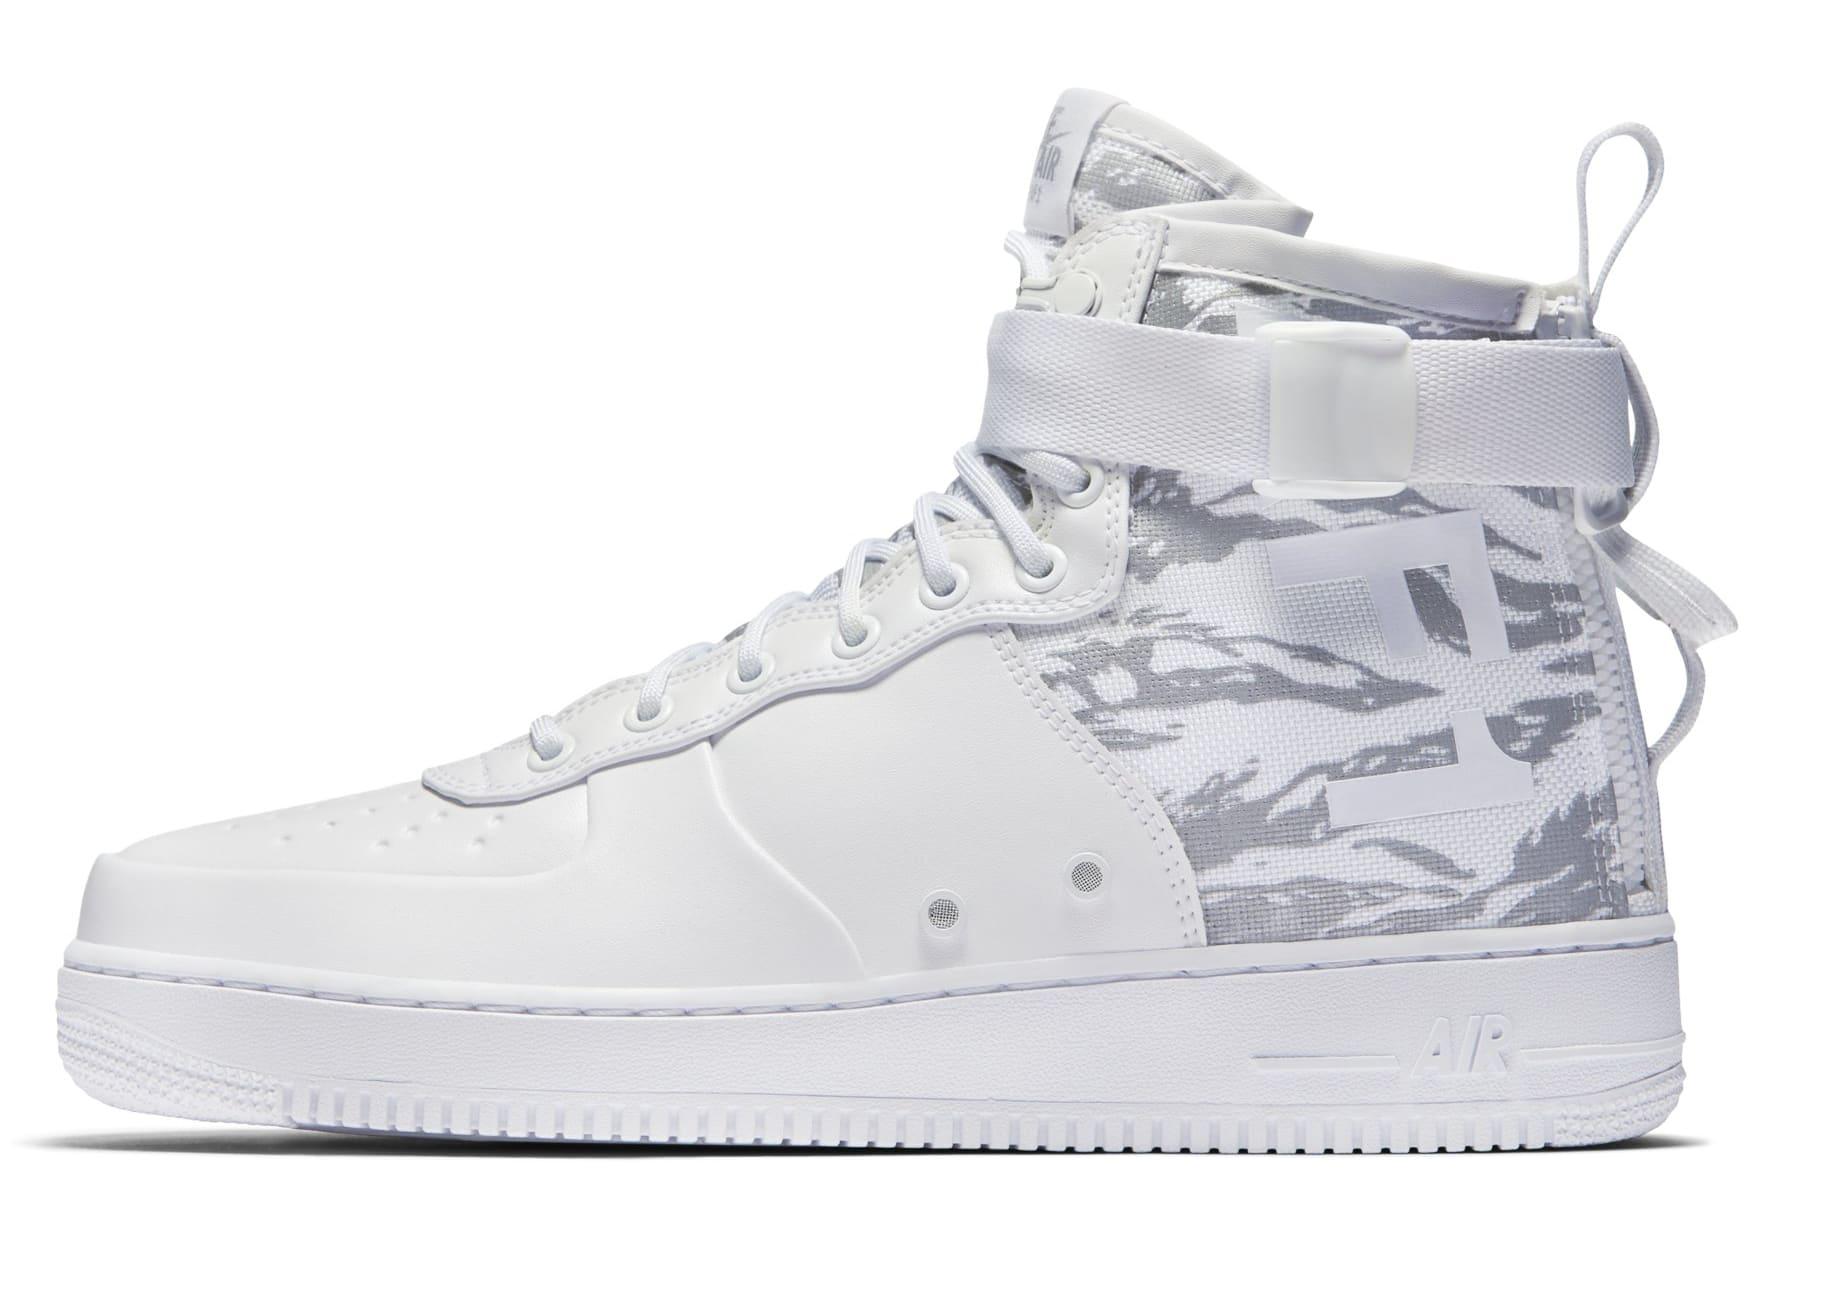 Nike SF AF1 White Winter